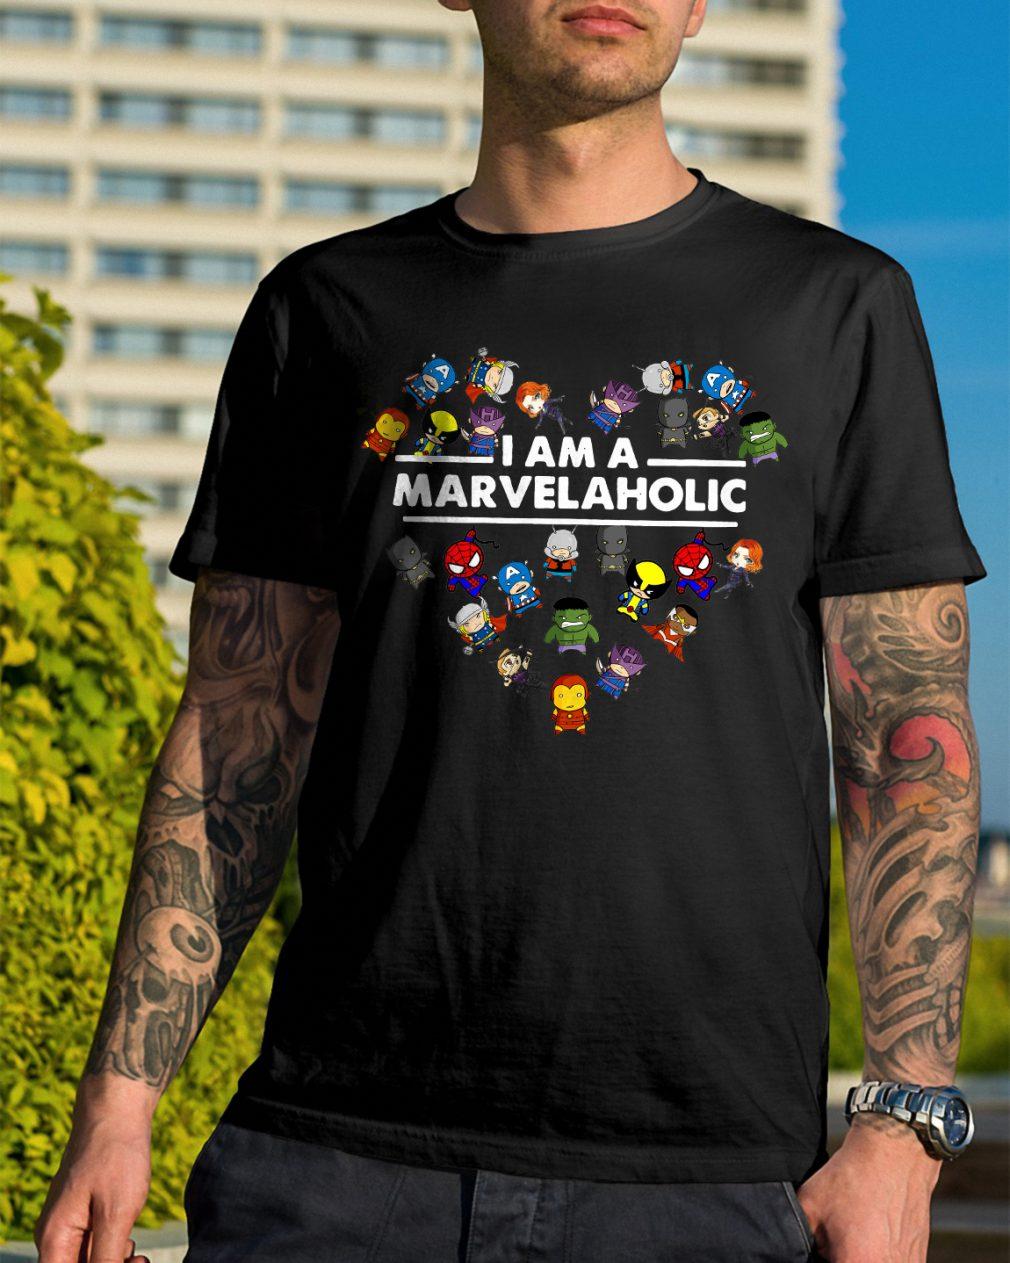 Marvelaholic Shirt Marvel Shirt